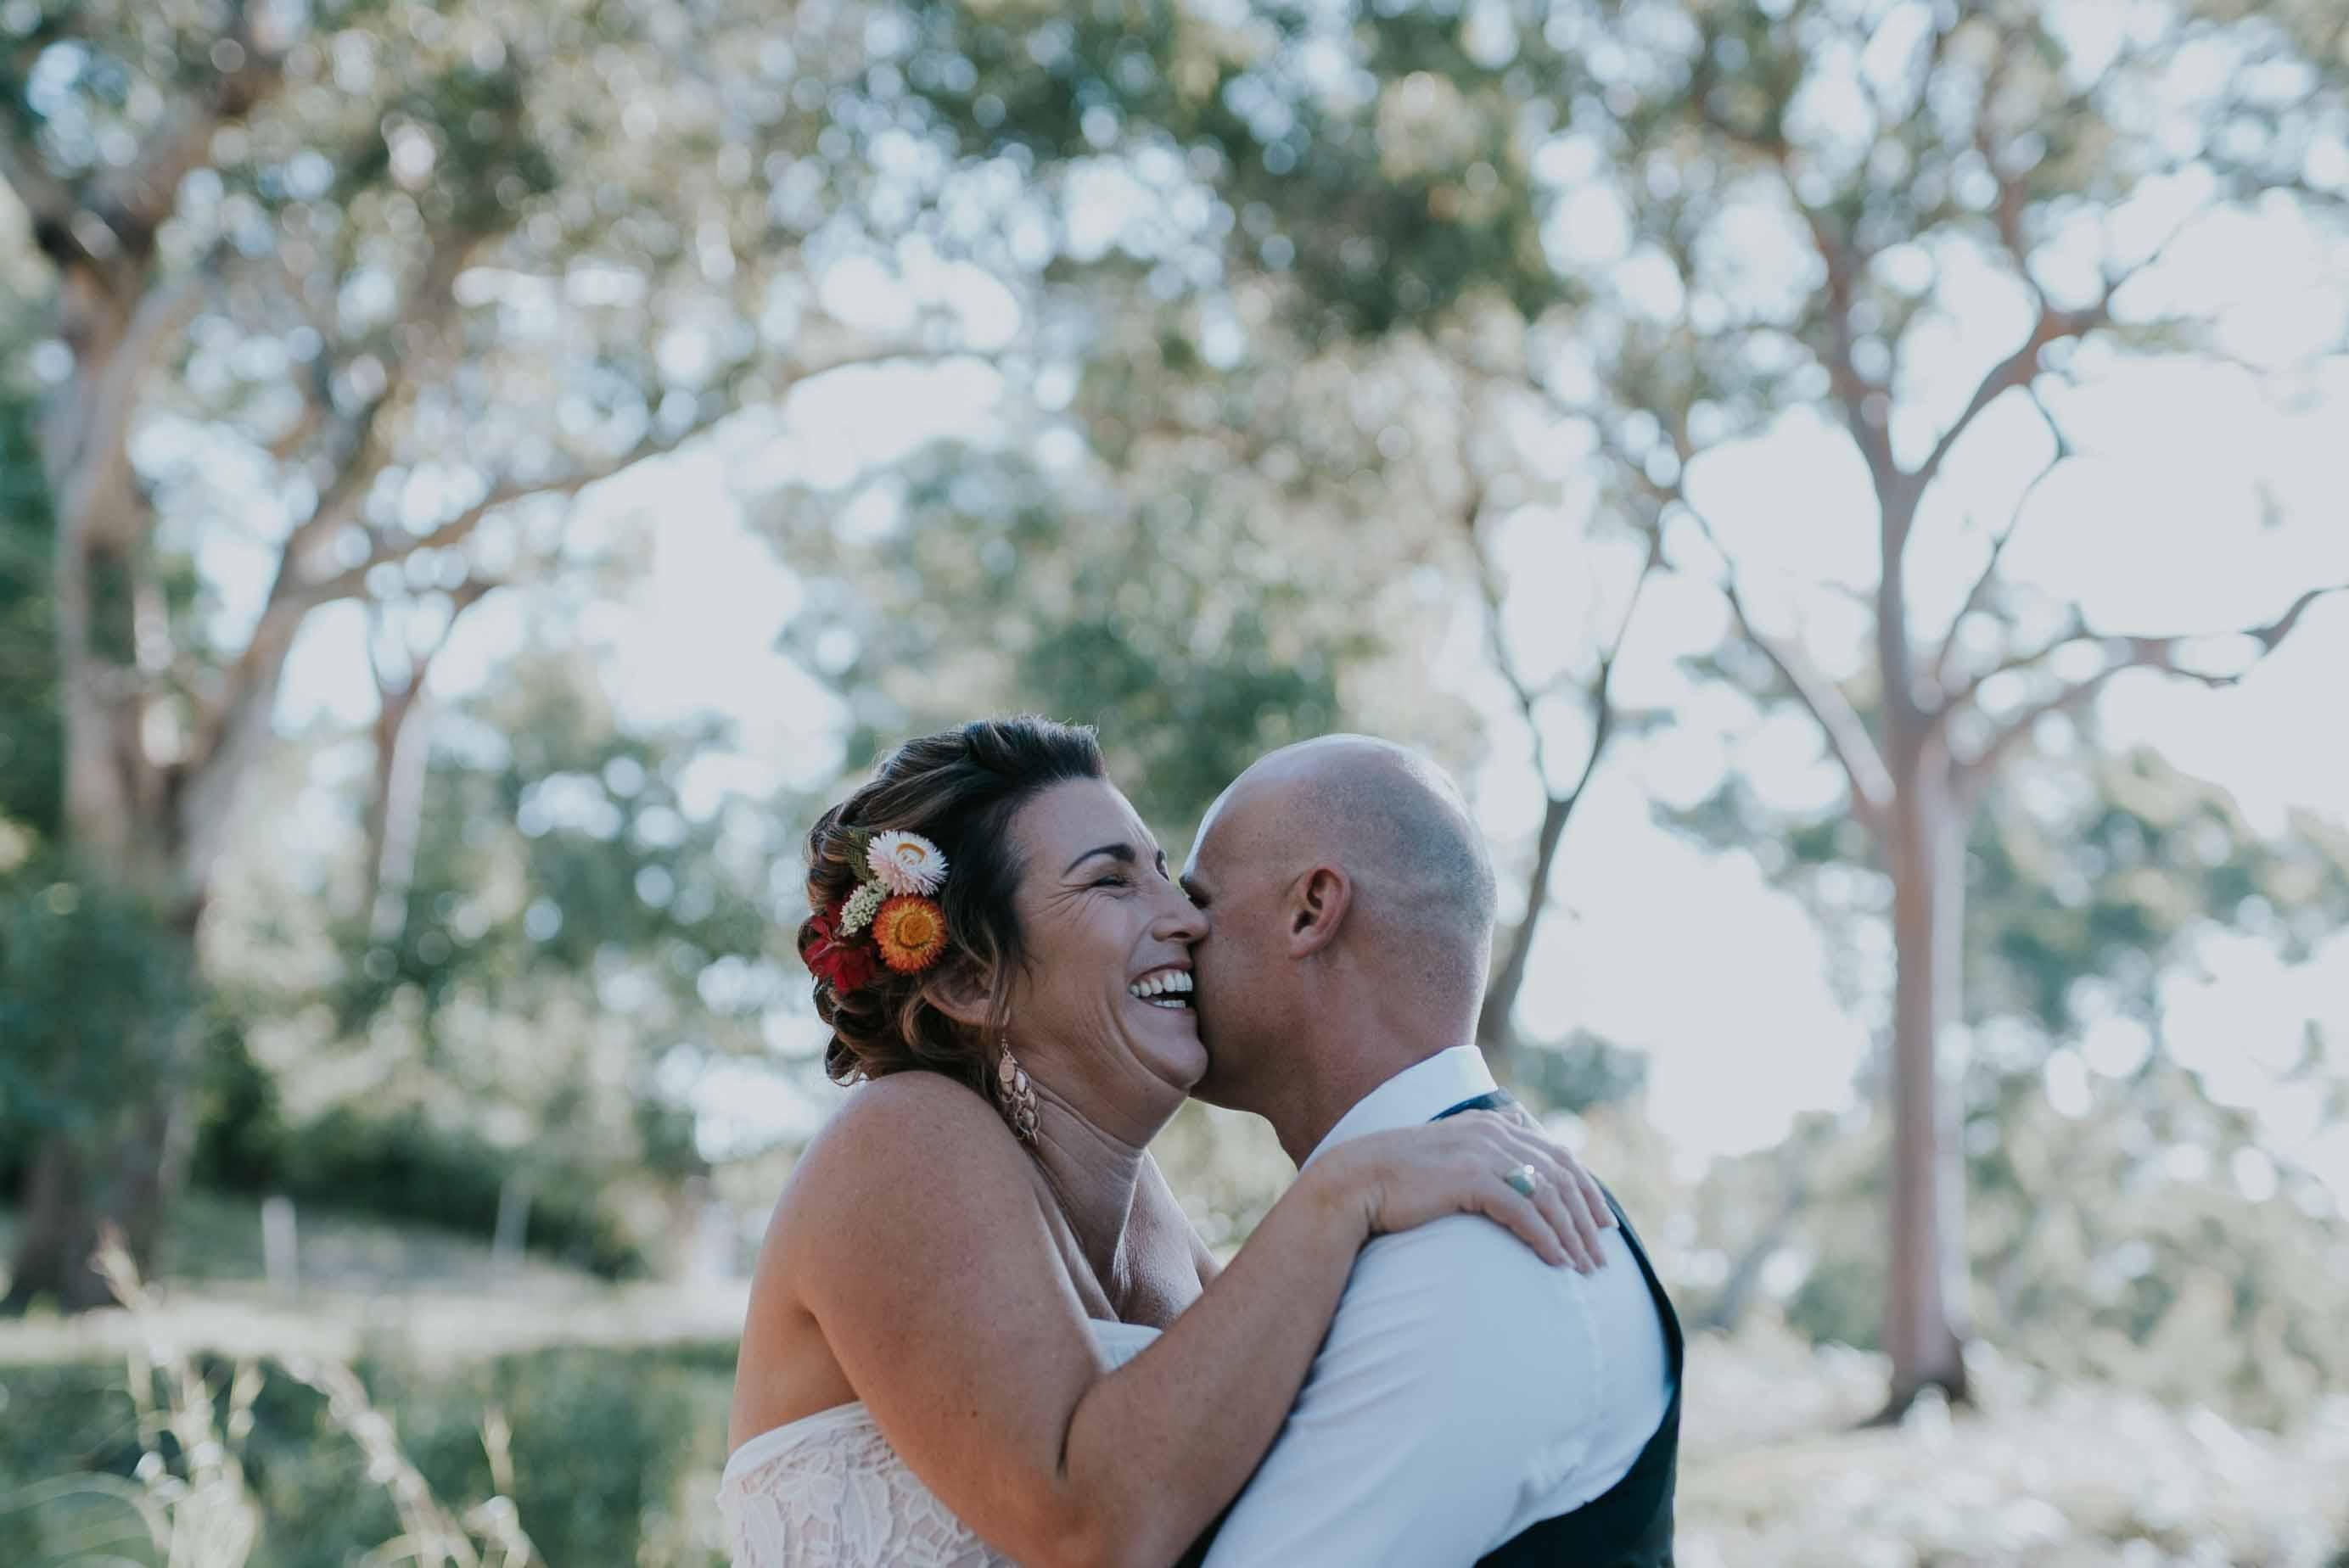 Paul + Natalie | 11/03/2017 | Port Stephens Wedding Video | Wonganella Estate, Bobs Farm, NSW